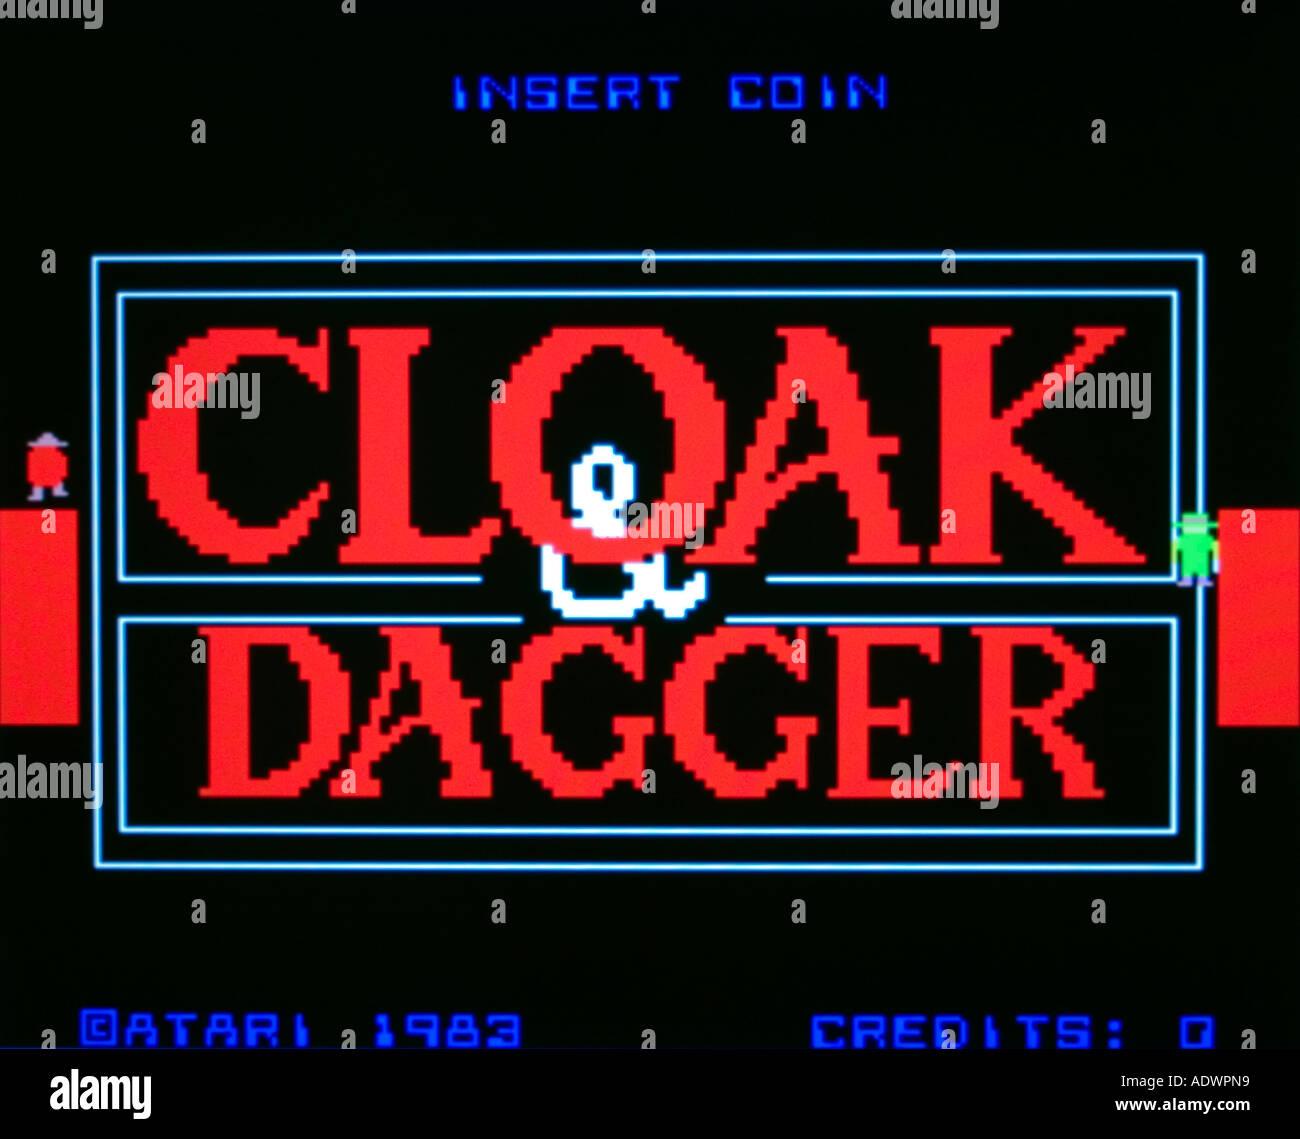 Cloak Dagger Atari 1983 vintage arcade videogame screenshot - EDITORIAL USE ONLY - Stock Image